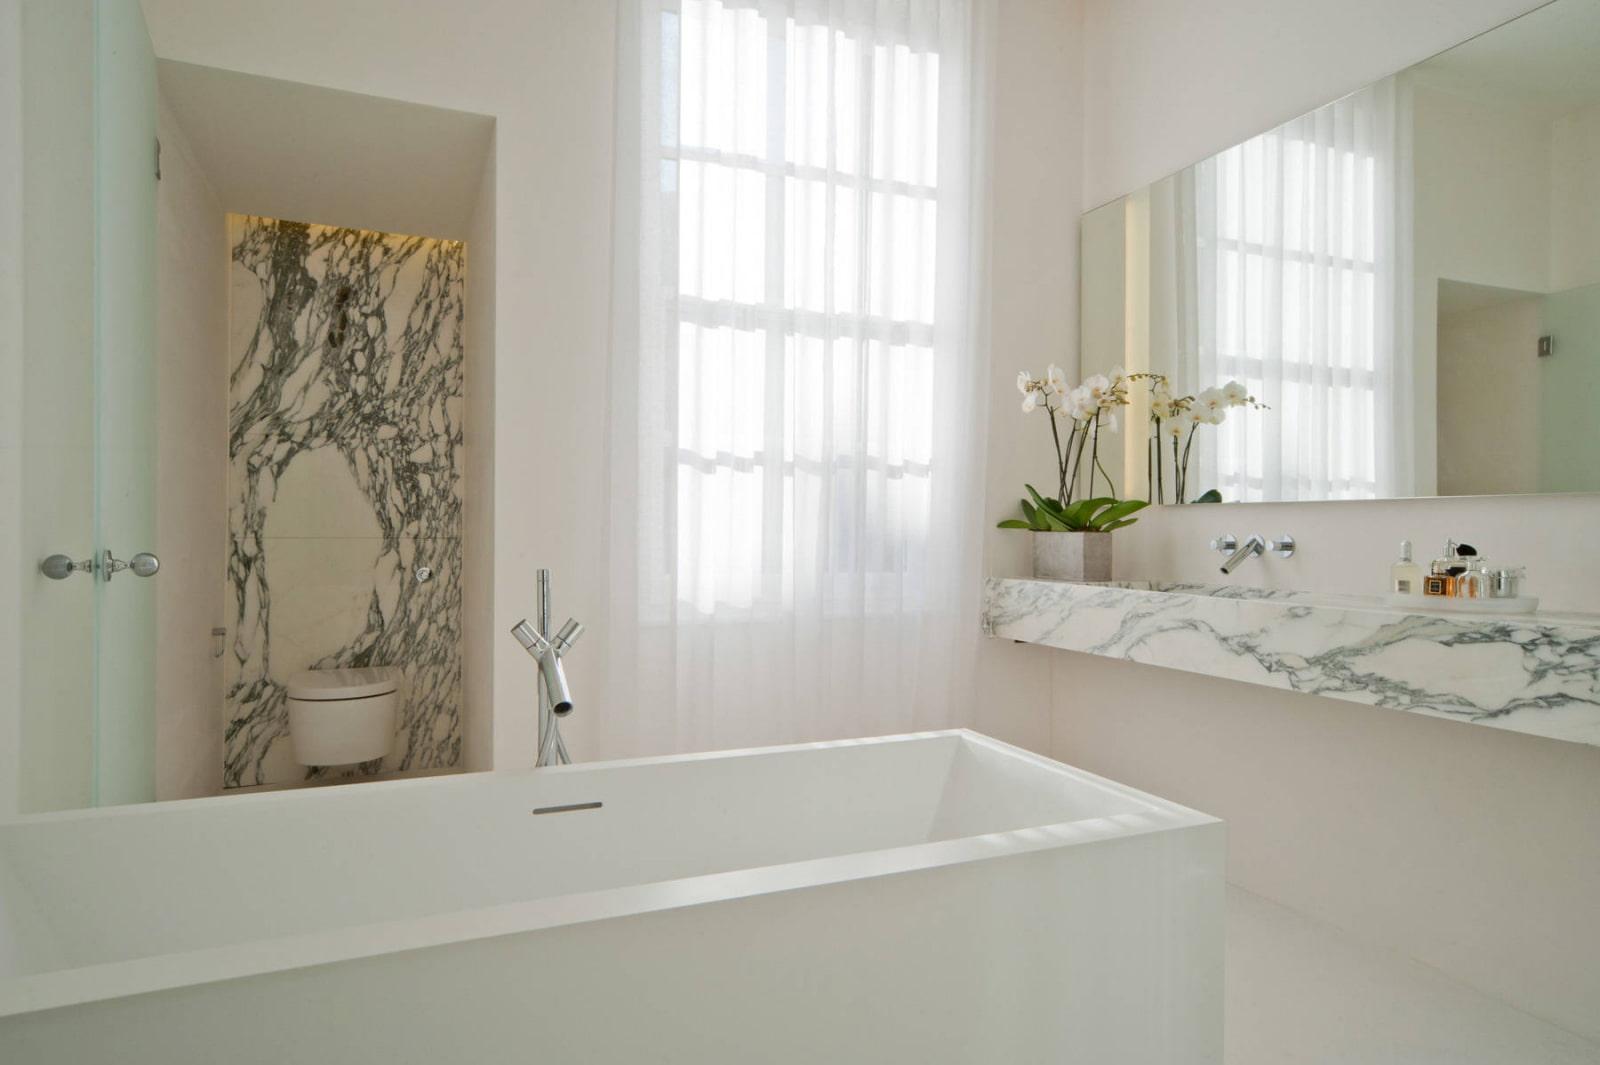 полки в ванной комнате под мрамор